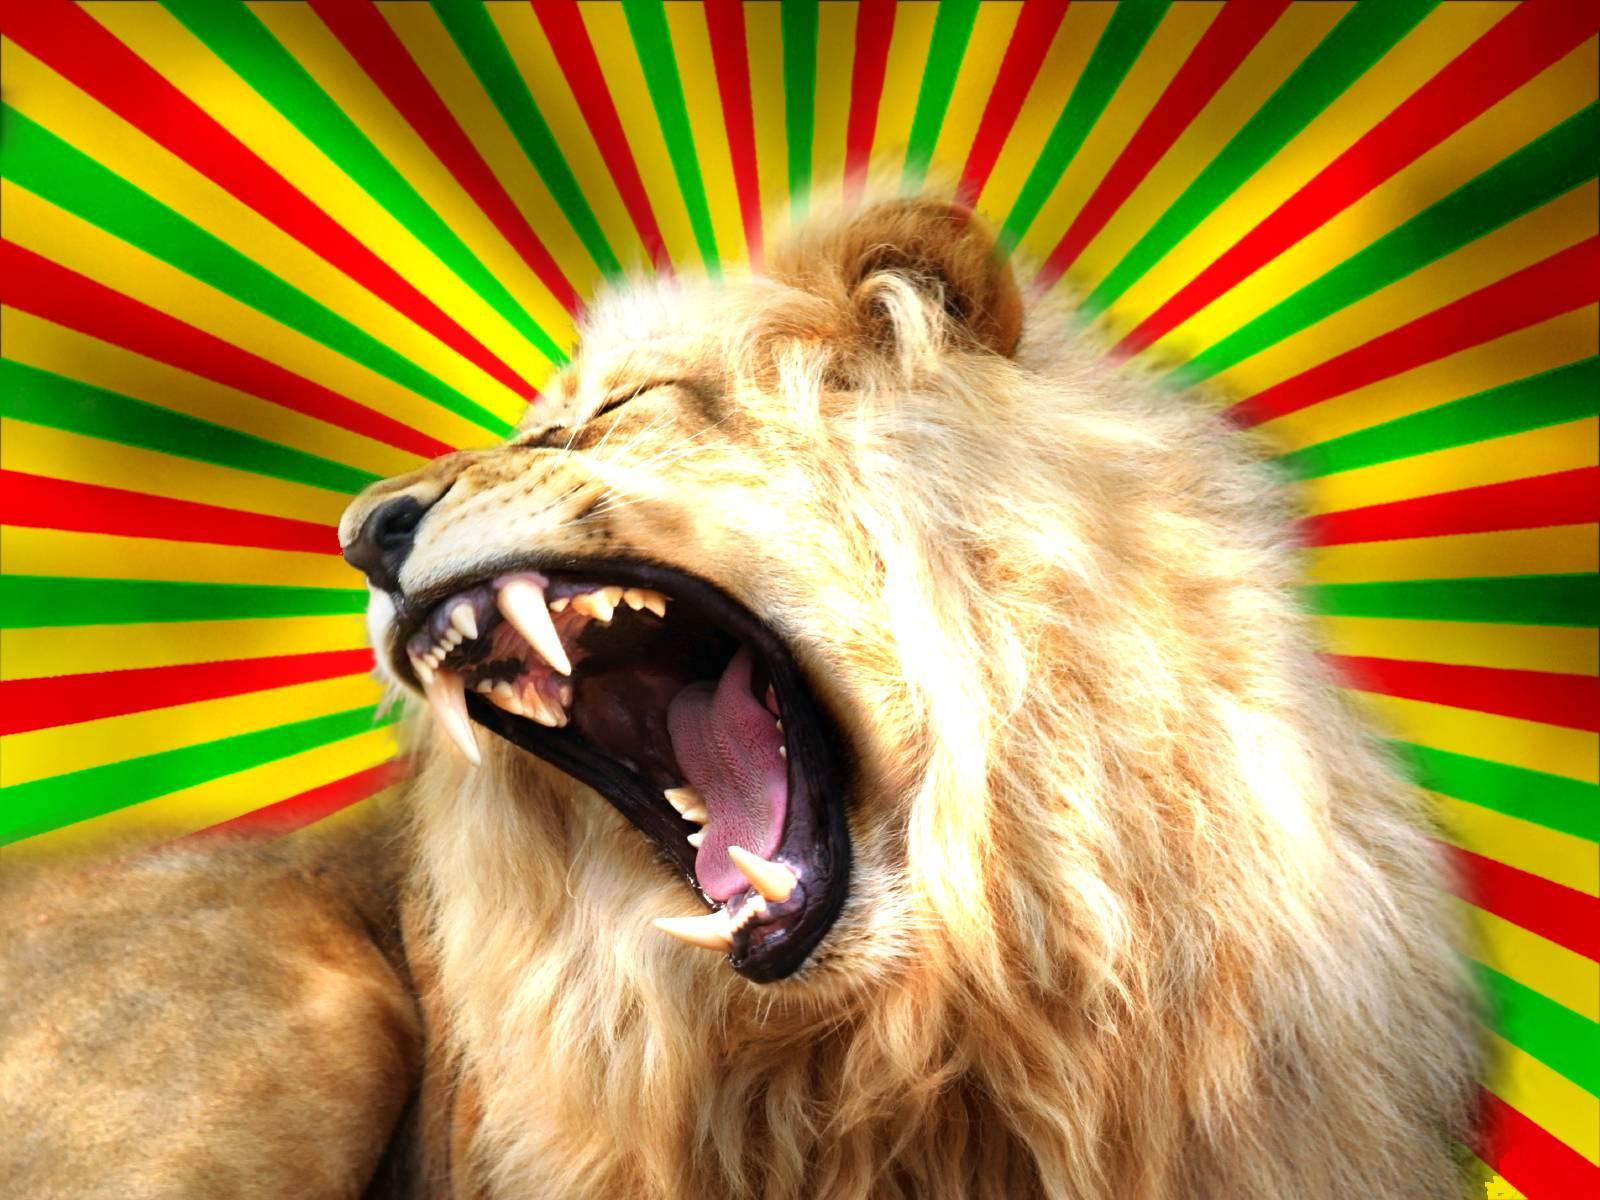 rastafarian lion wallpaper - photo #21